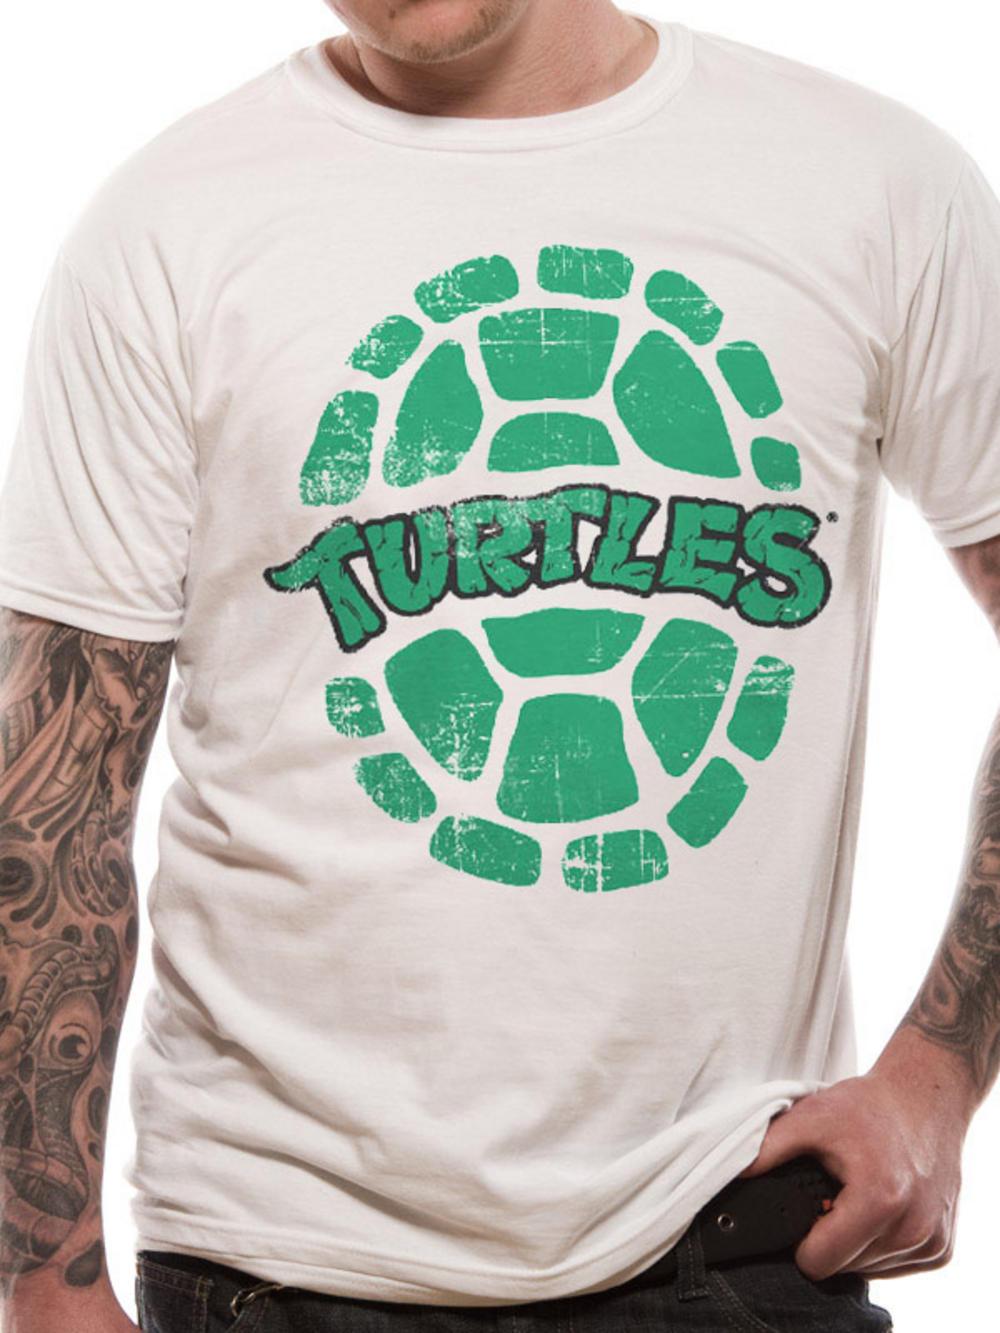 Teenage mutant ninja turtles shell t shirt buy teenage for Where can i buy ninja turtle shirts